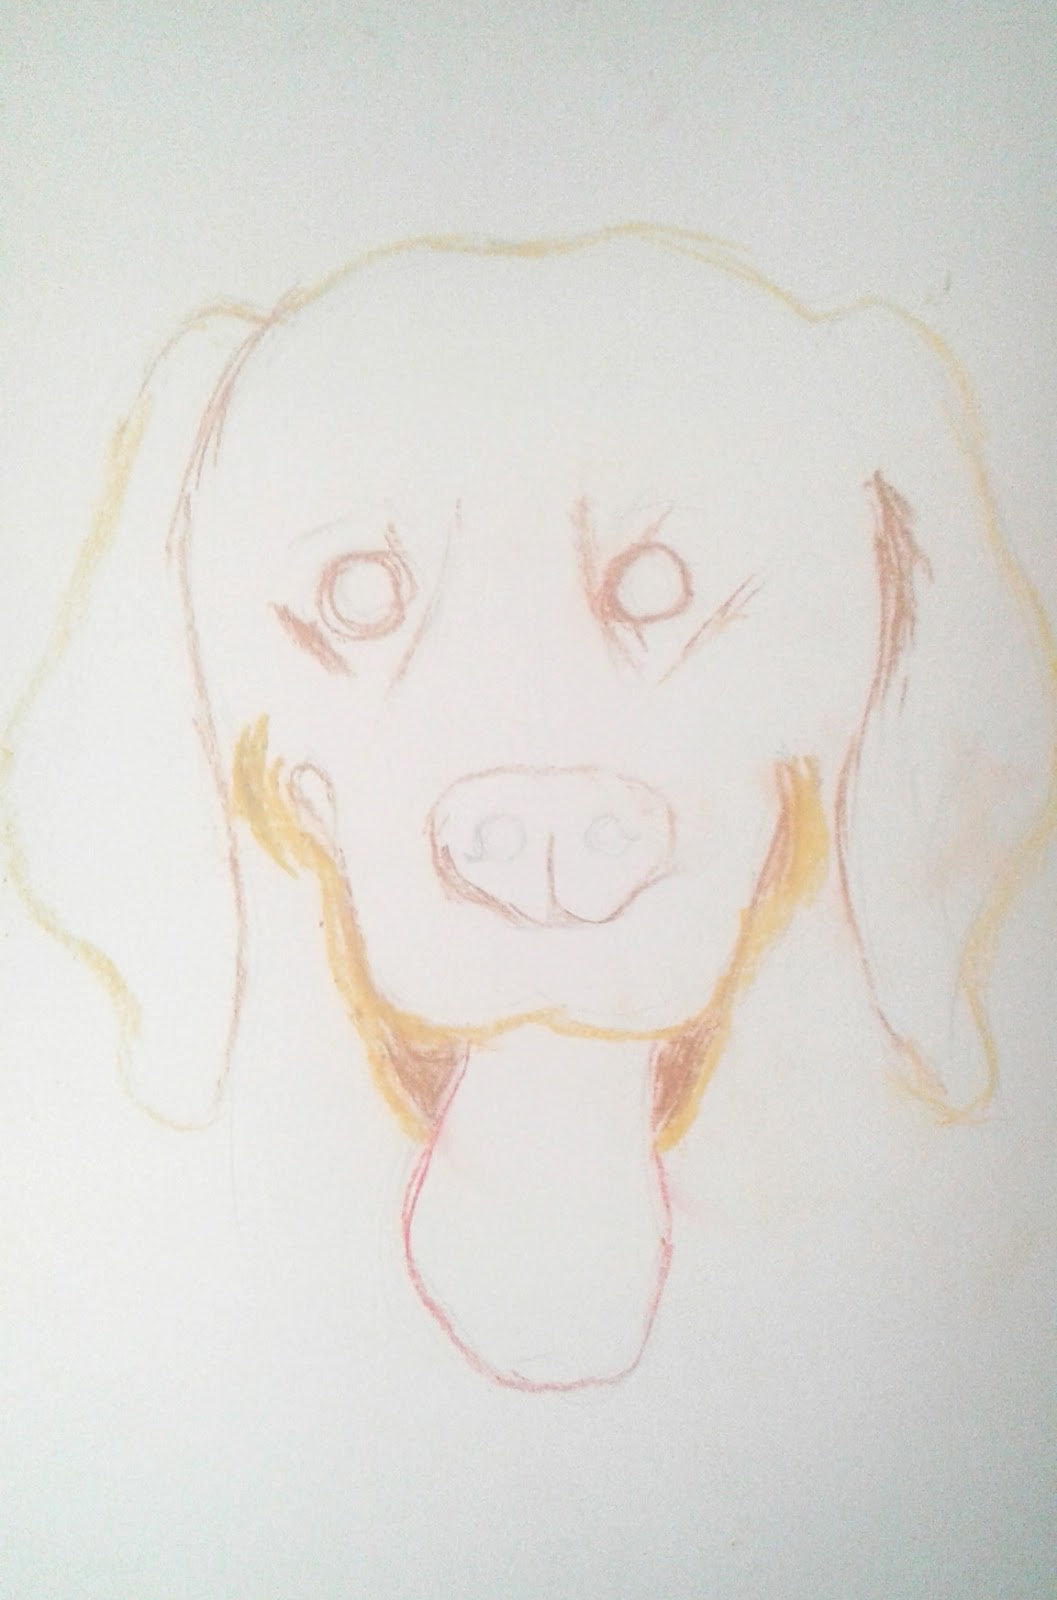 Mewarnai Gambar Seekor Anjing Menggunakan Pastel NUANSA GAMBAR